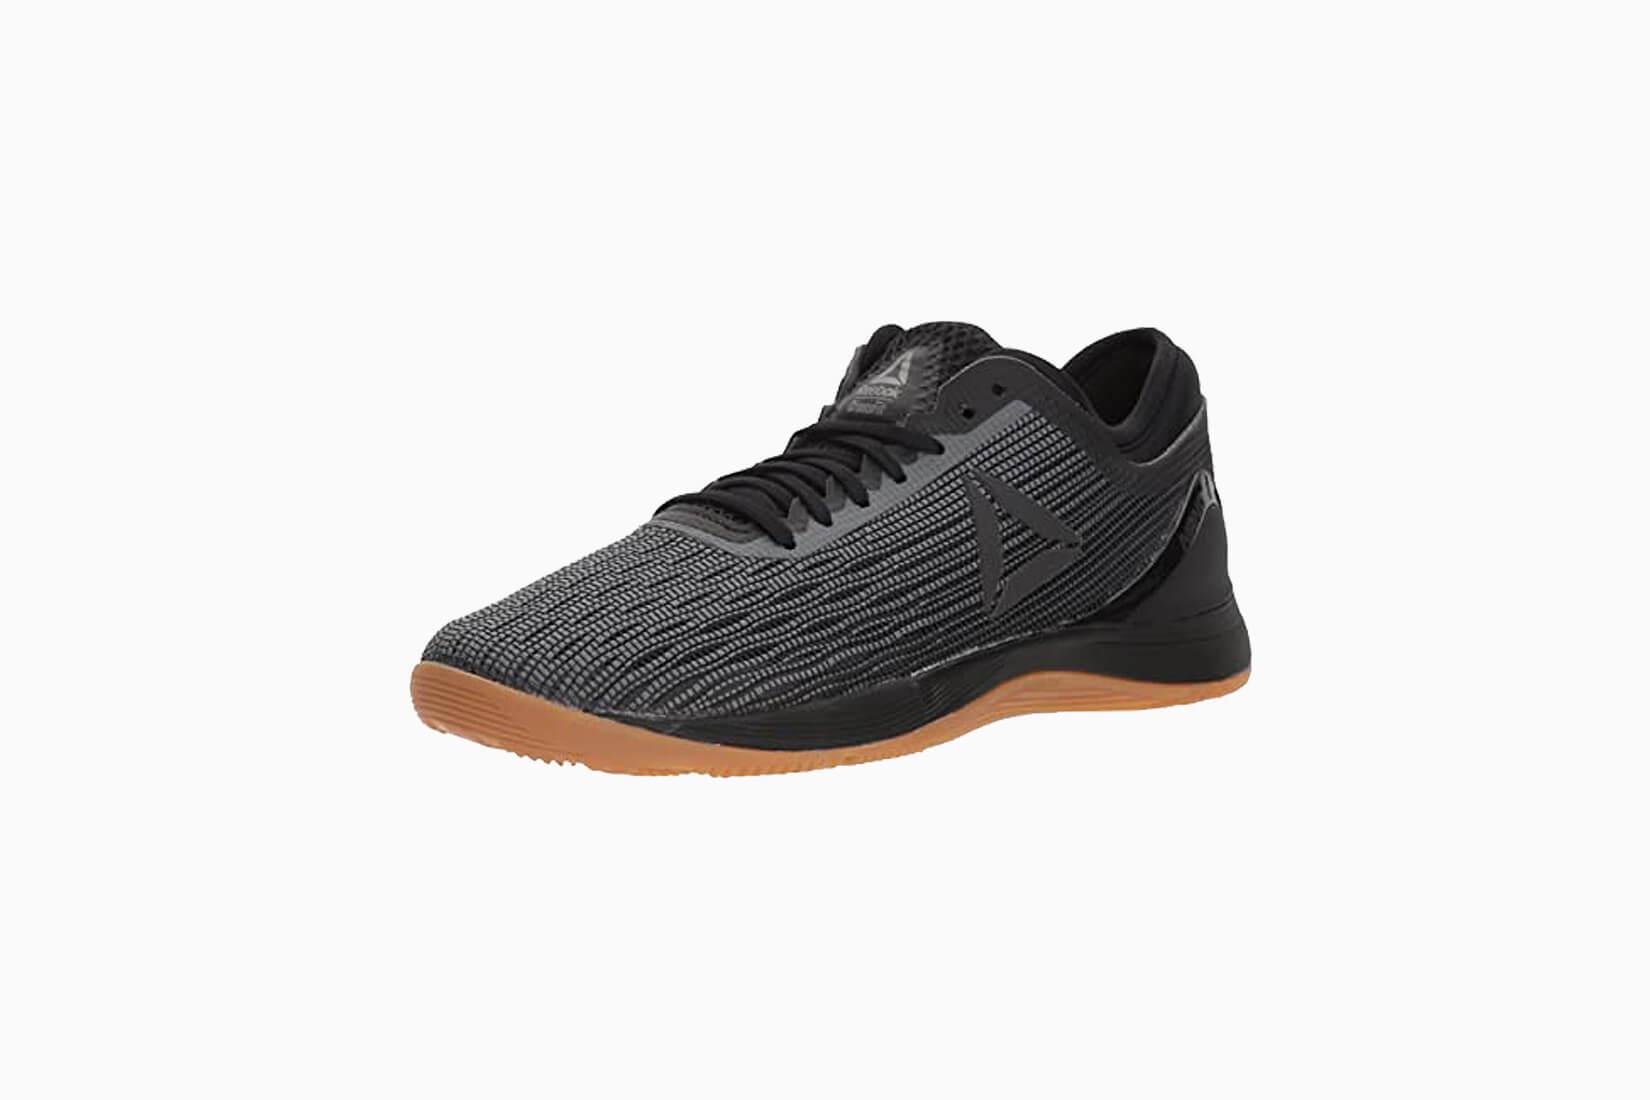 best workout shoes women rebook crossfit review - Luxe Digital